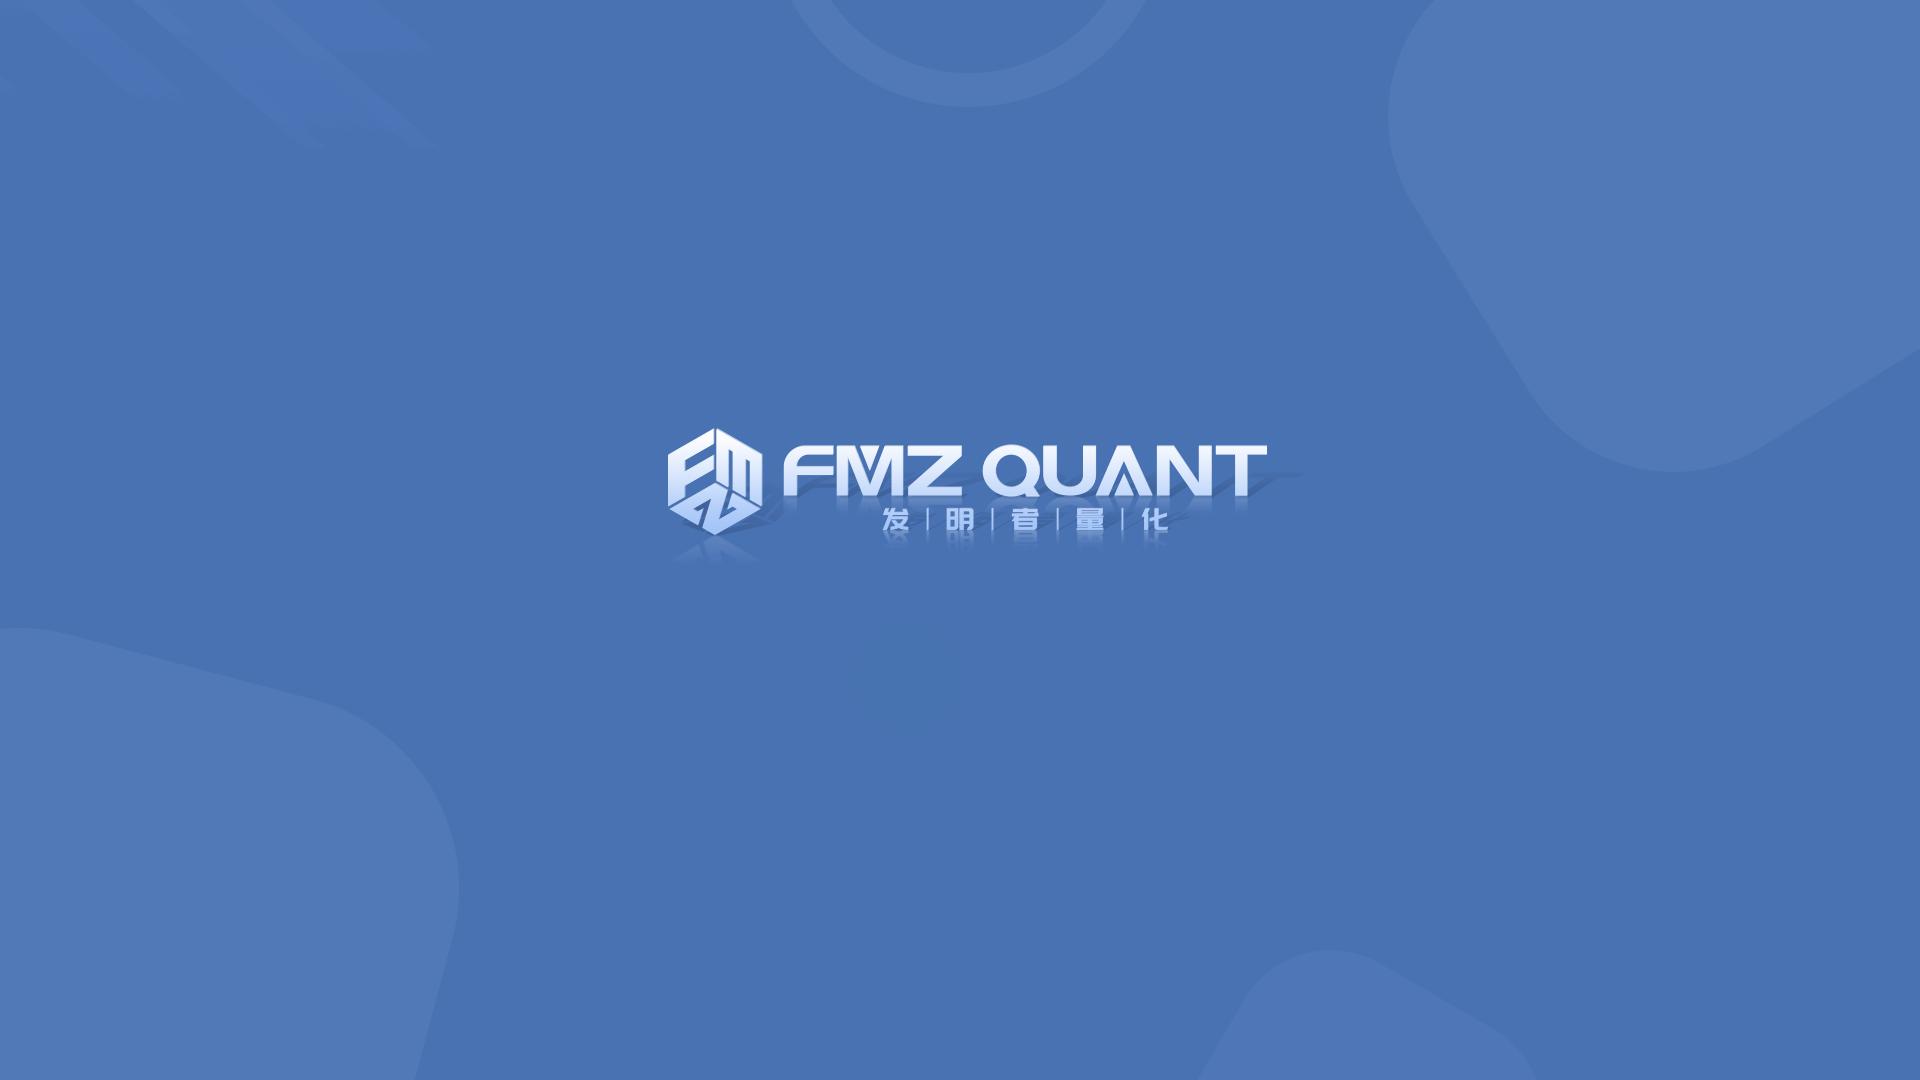 FMZ量化平台一些值得学习的比特币及数字货币量化策略